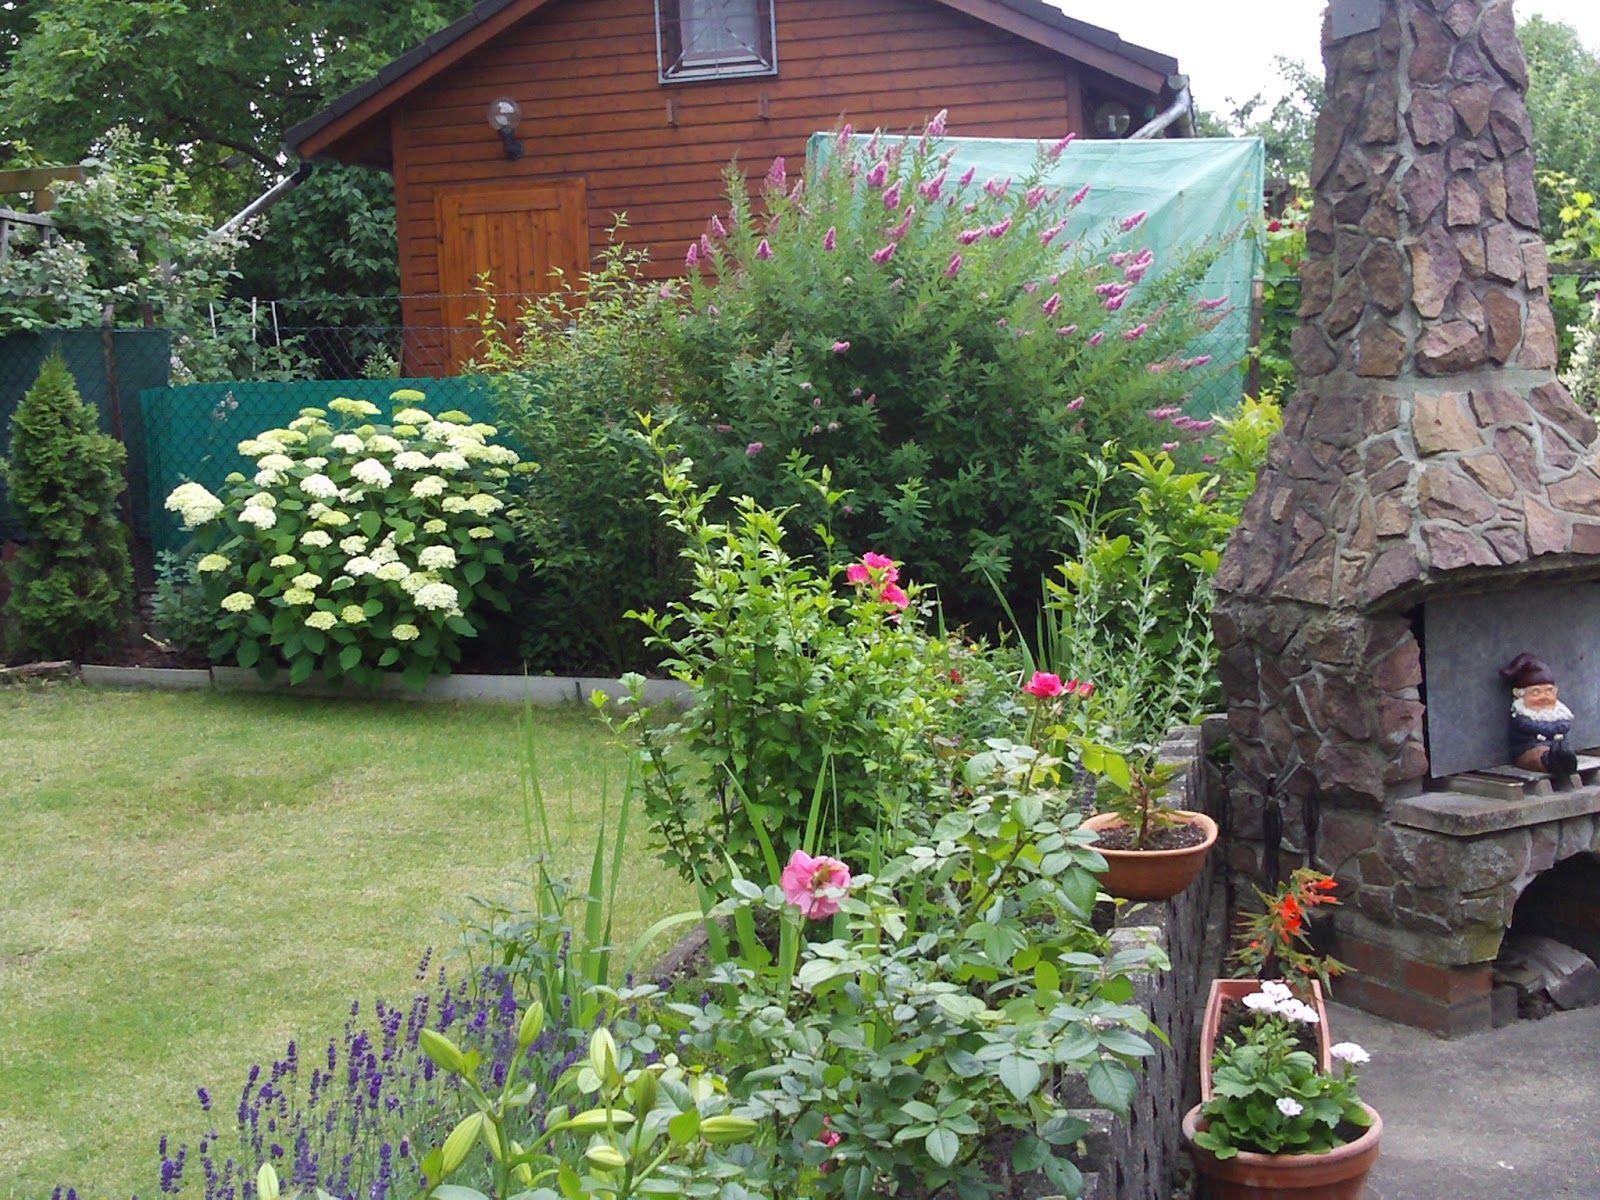 Buy blue dune lyme grass in nw arkansas - Spirea Triumphans Billardi Big Flowering Shrub In Back Row Mine Is In Year 4